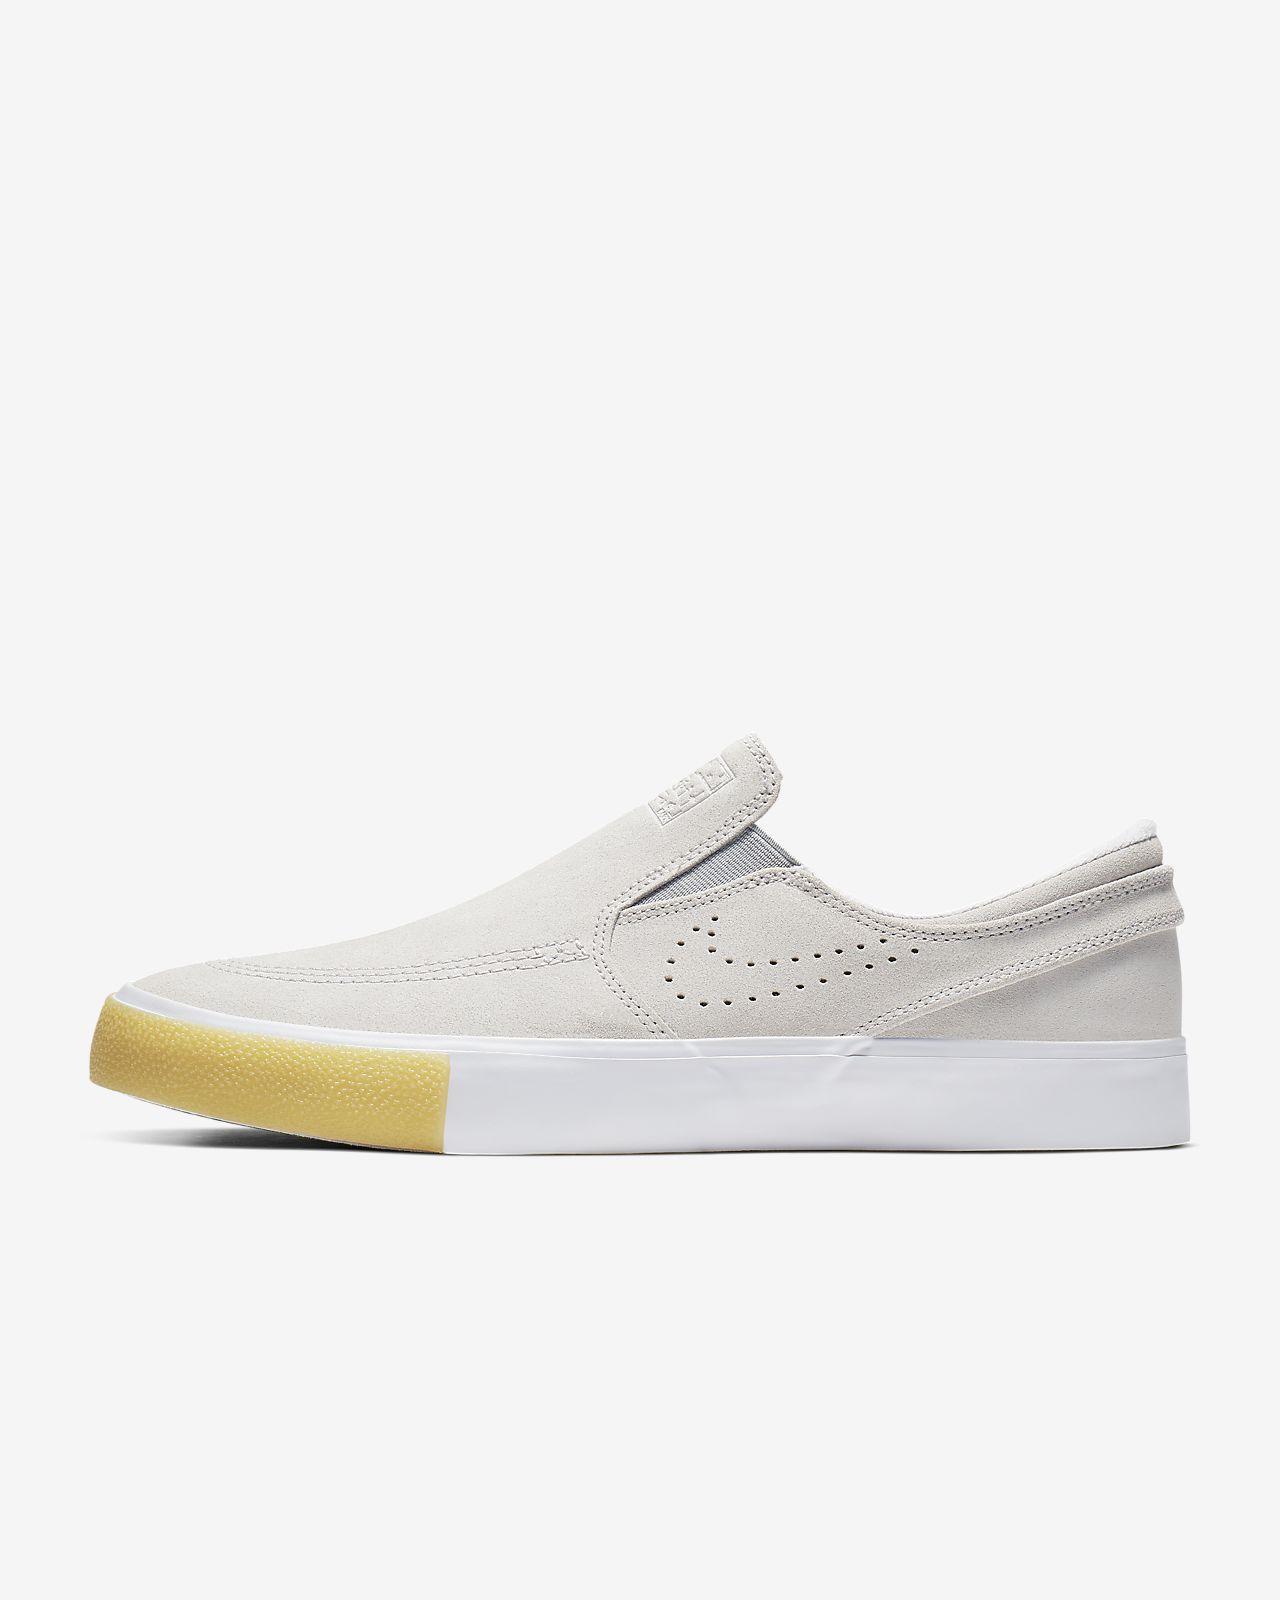 Nike SB Zoom Stefan Janoski Slip RM SE Zapatillas de skateboard